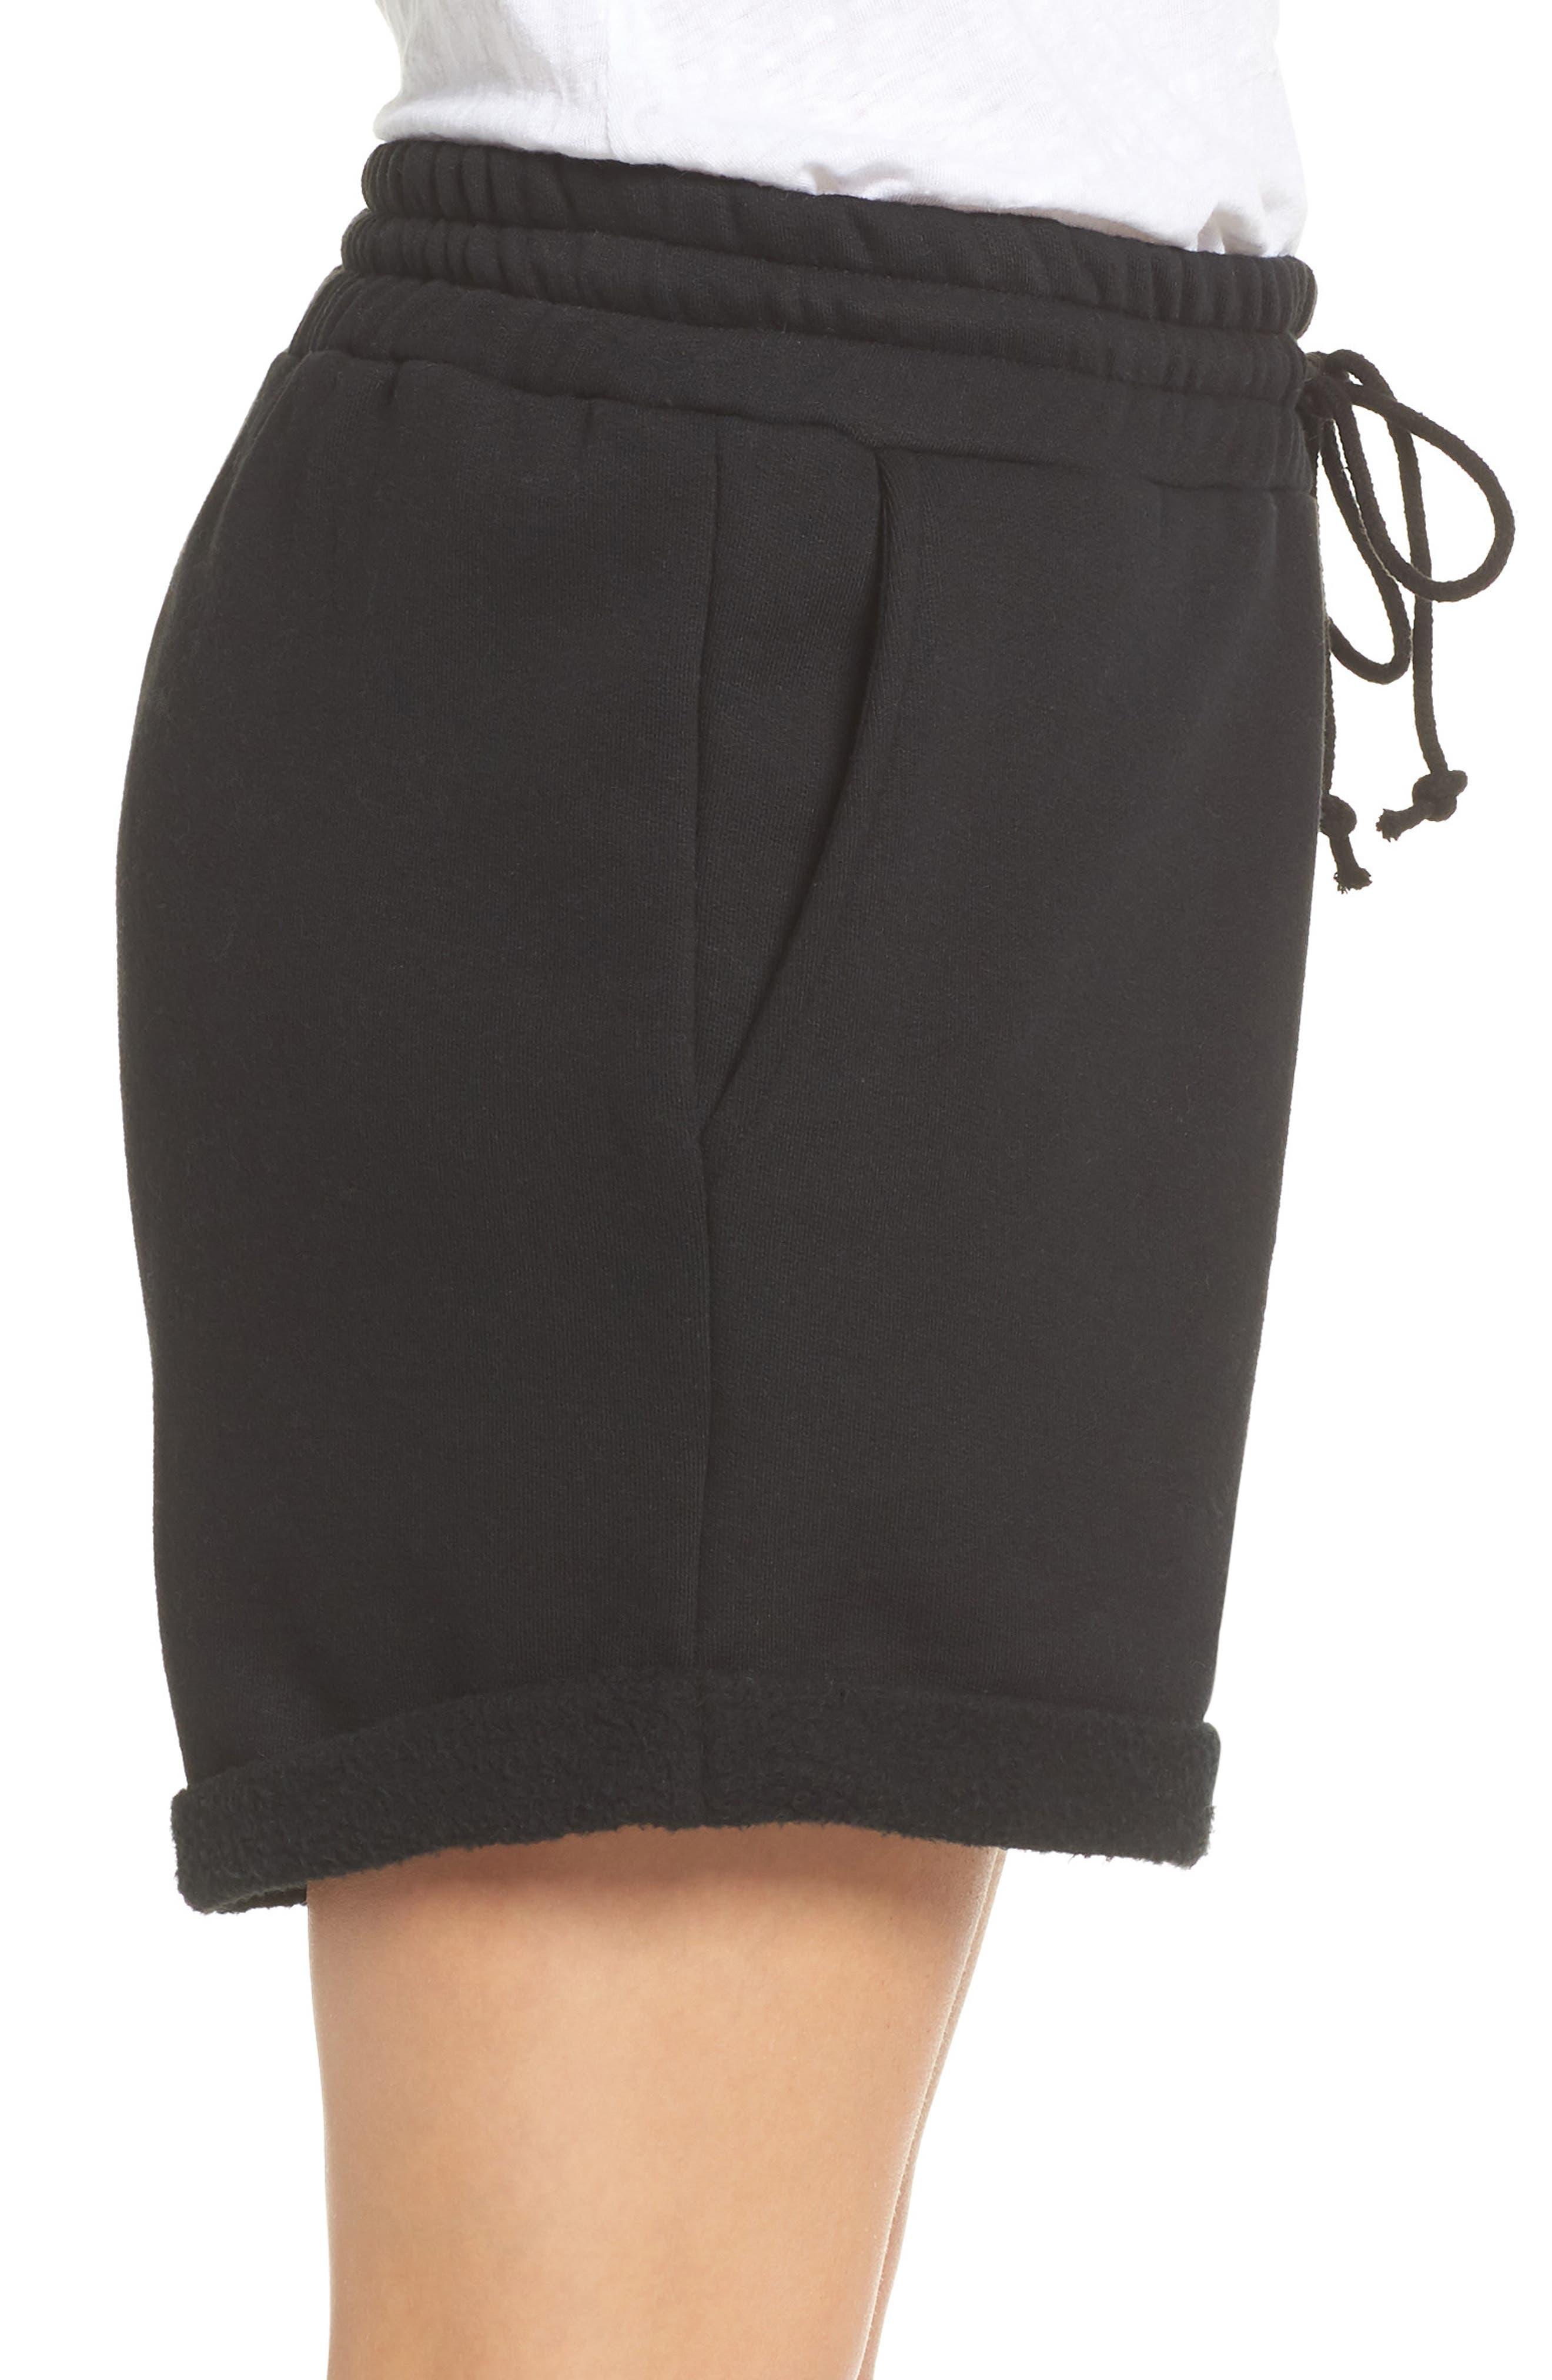 Blonde Lounge Shorts,                             Alternate thumbnail 3, color,                             008